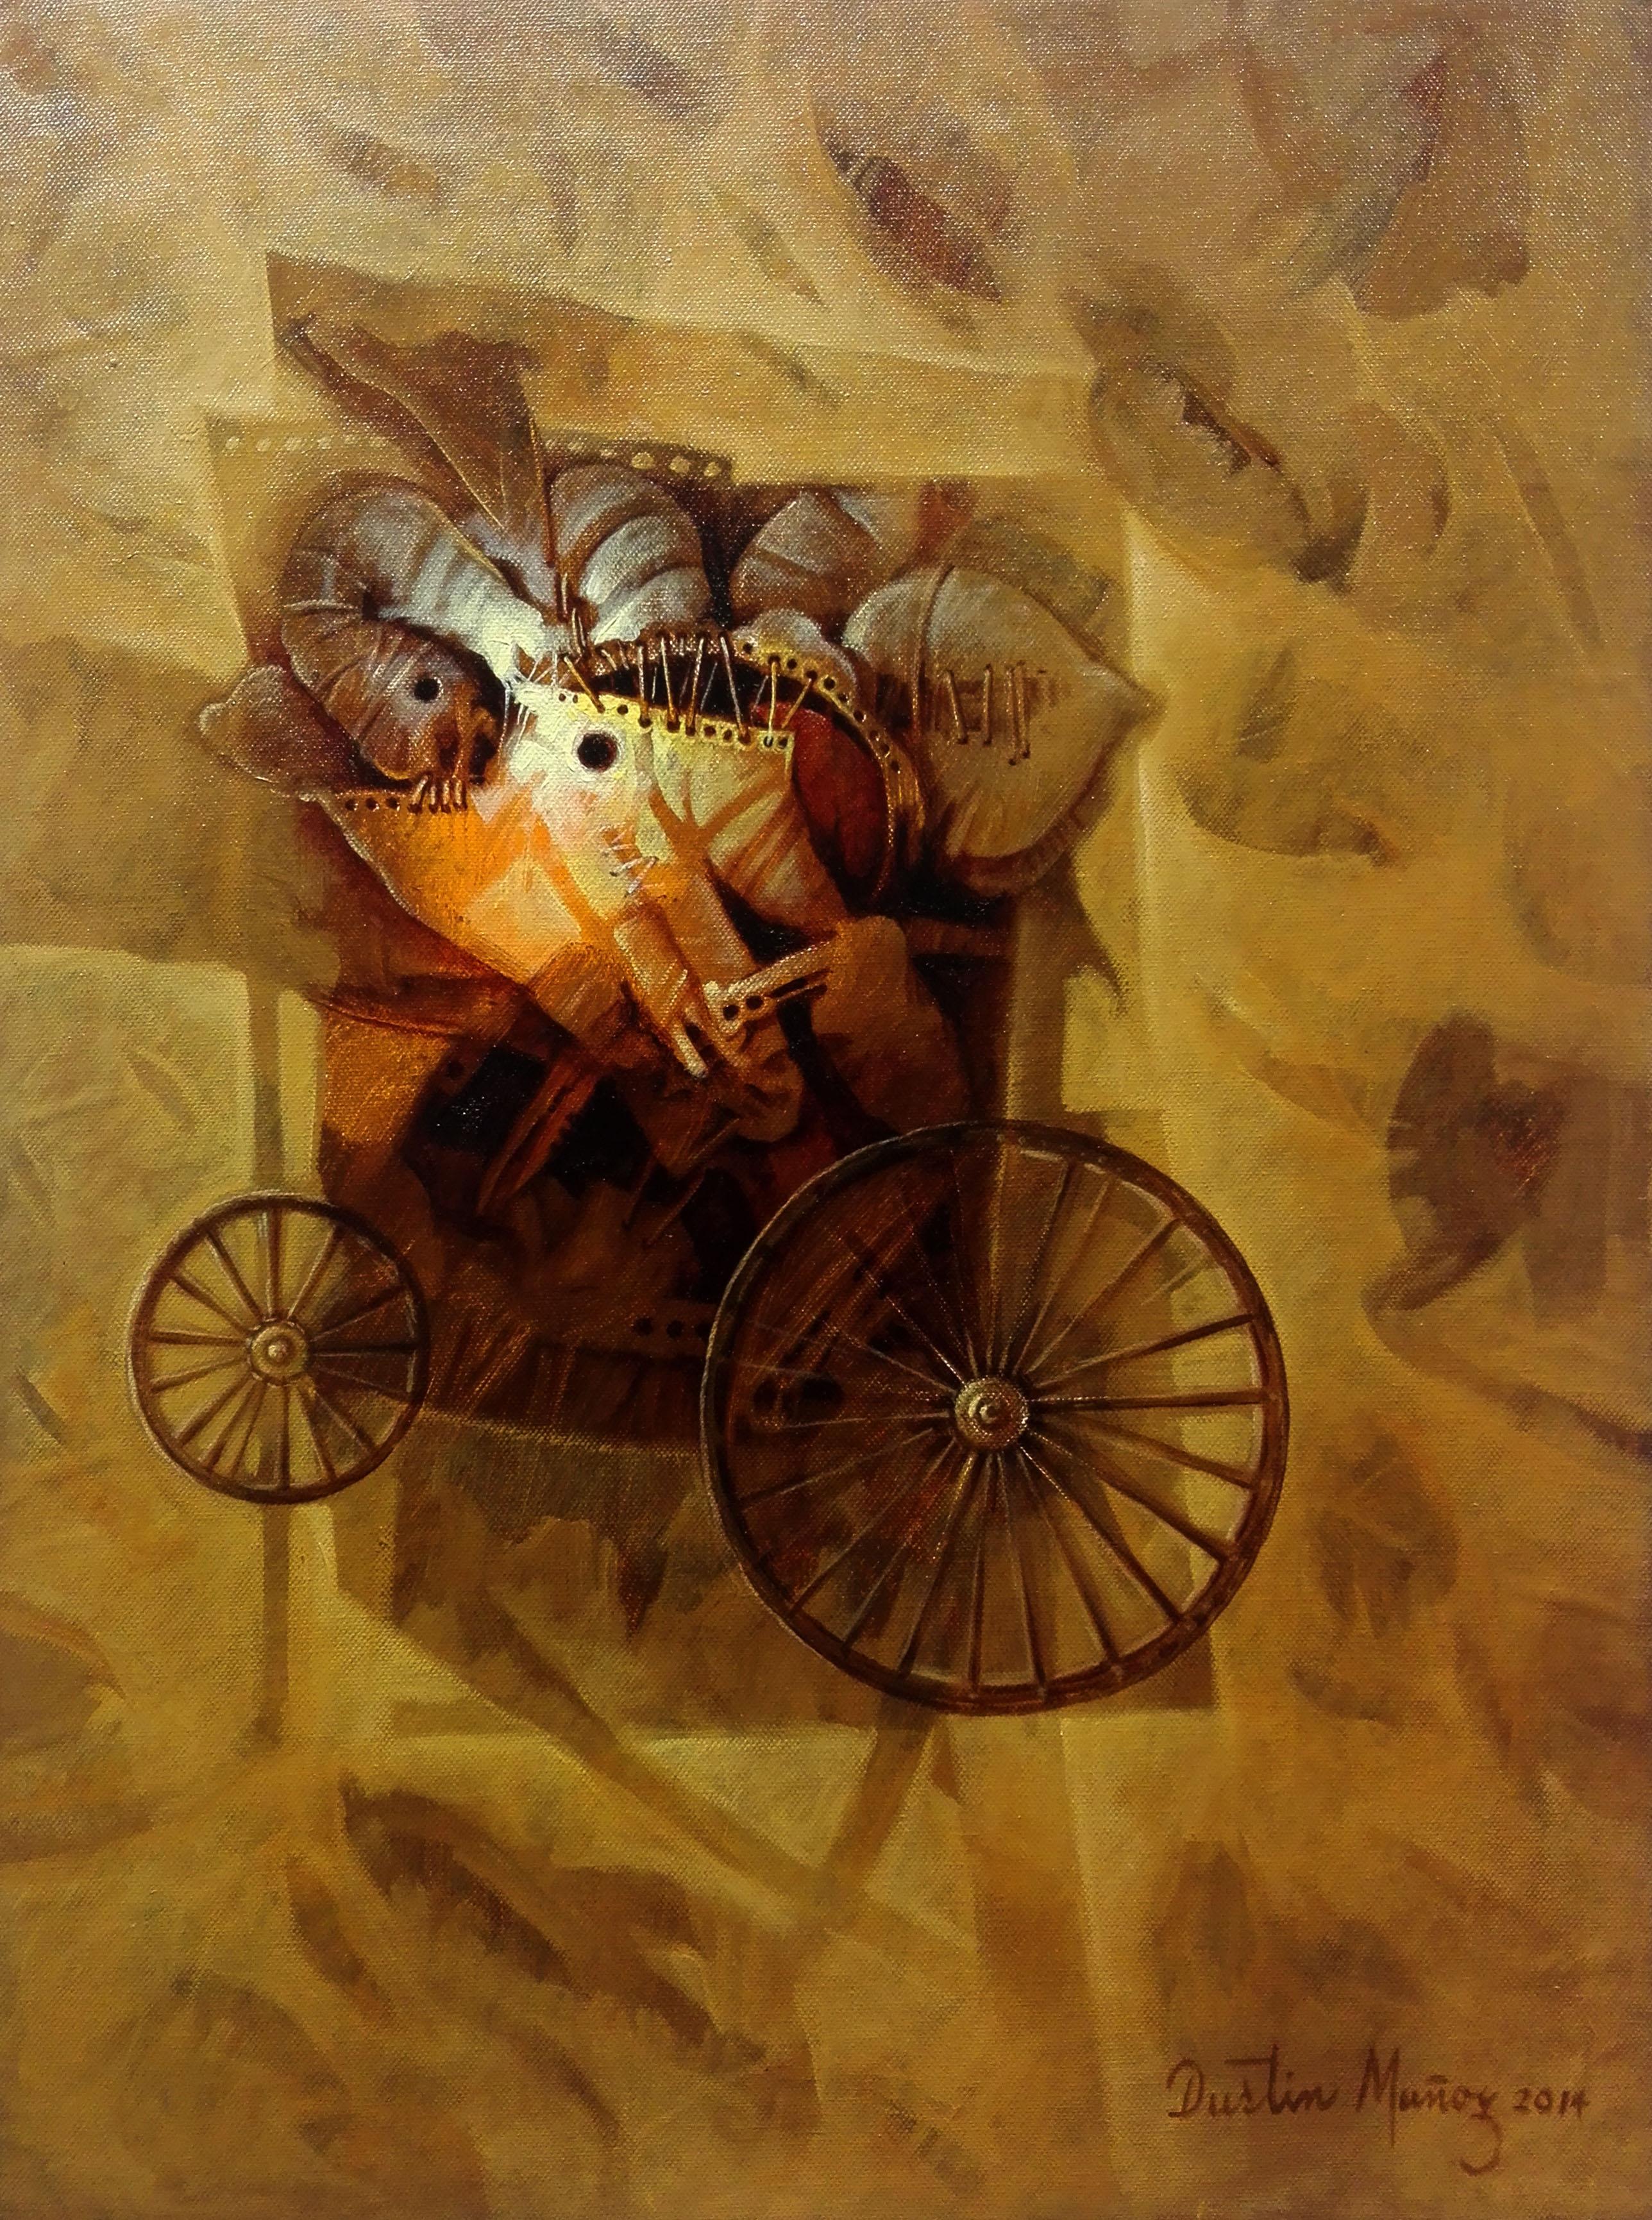 Baúl de recuerdos, 61x45.5 cms, 2014, Dustin Muñoz